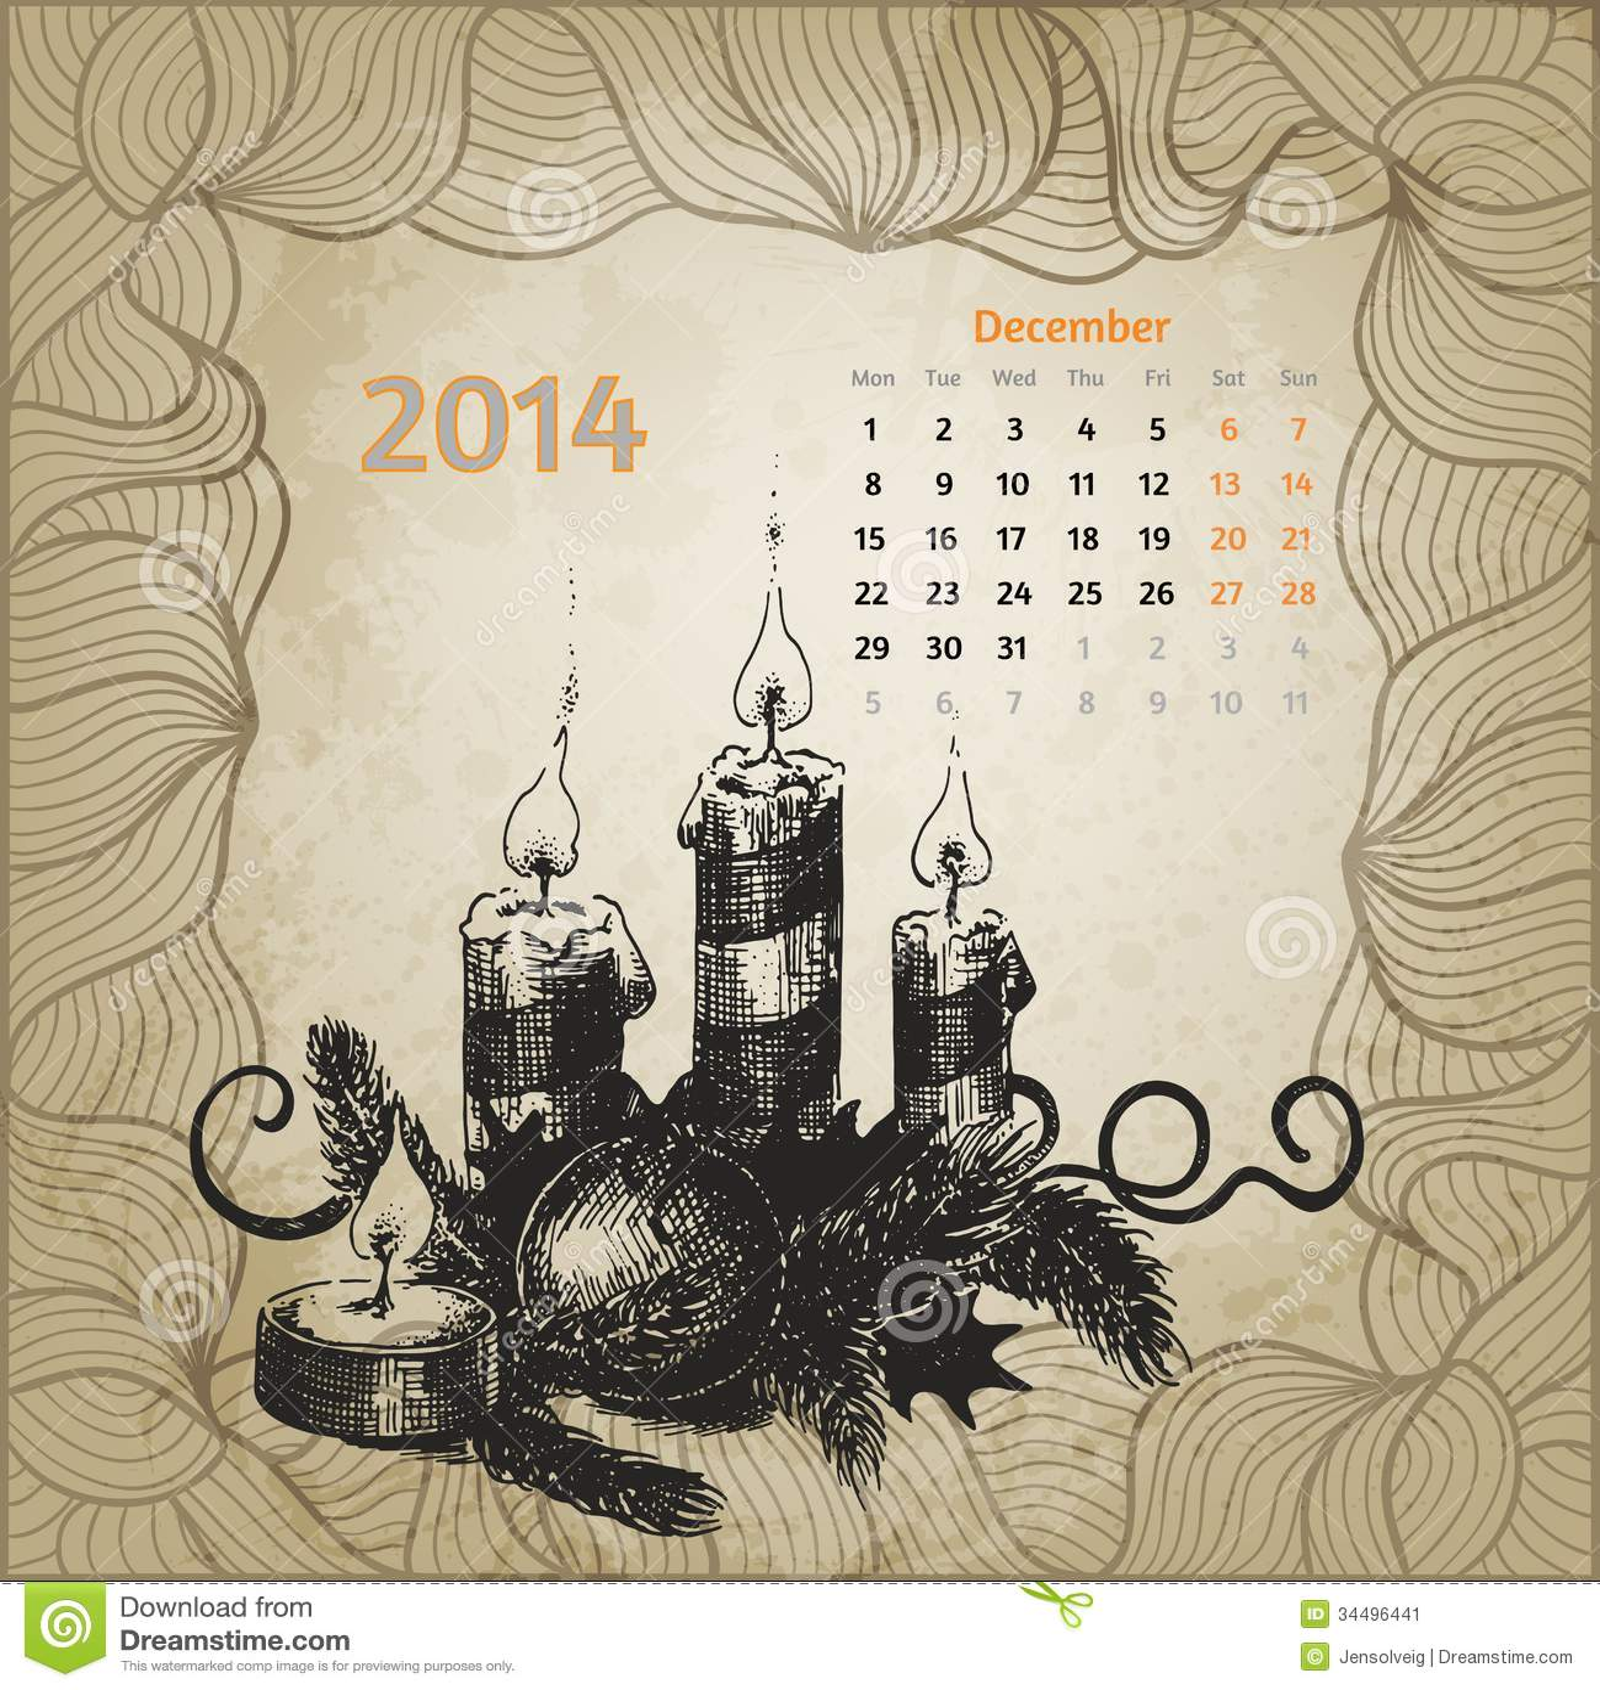 Calendar Artistic : Artistic vintage calendar for december stock vector